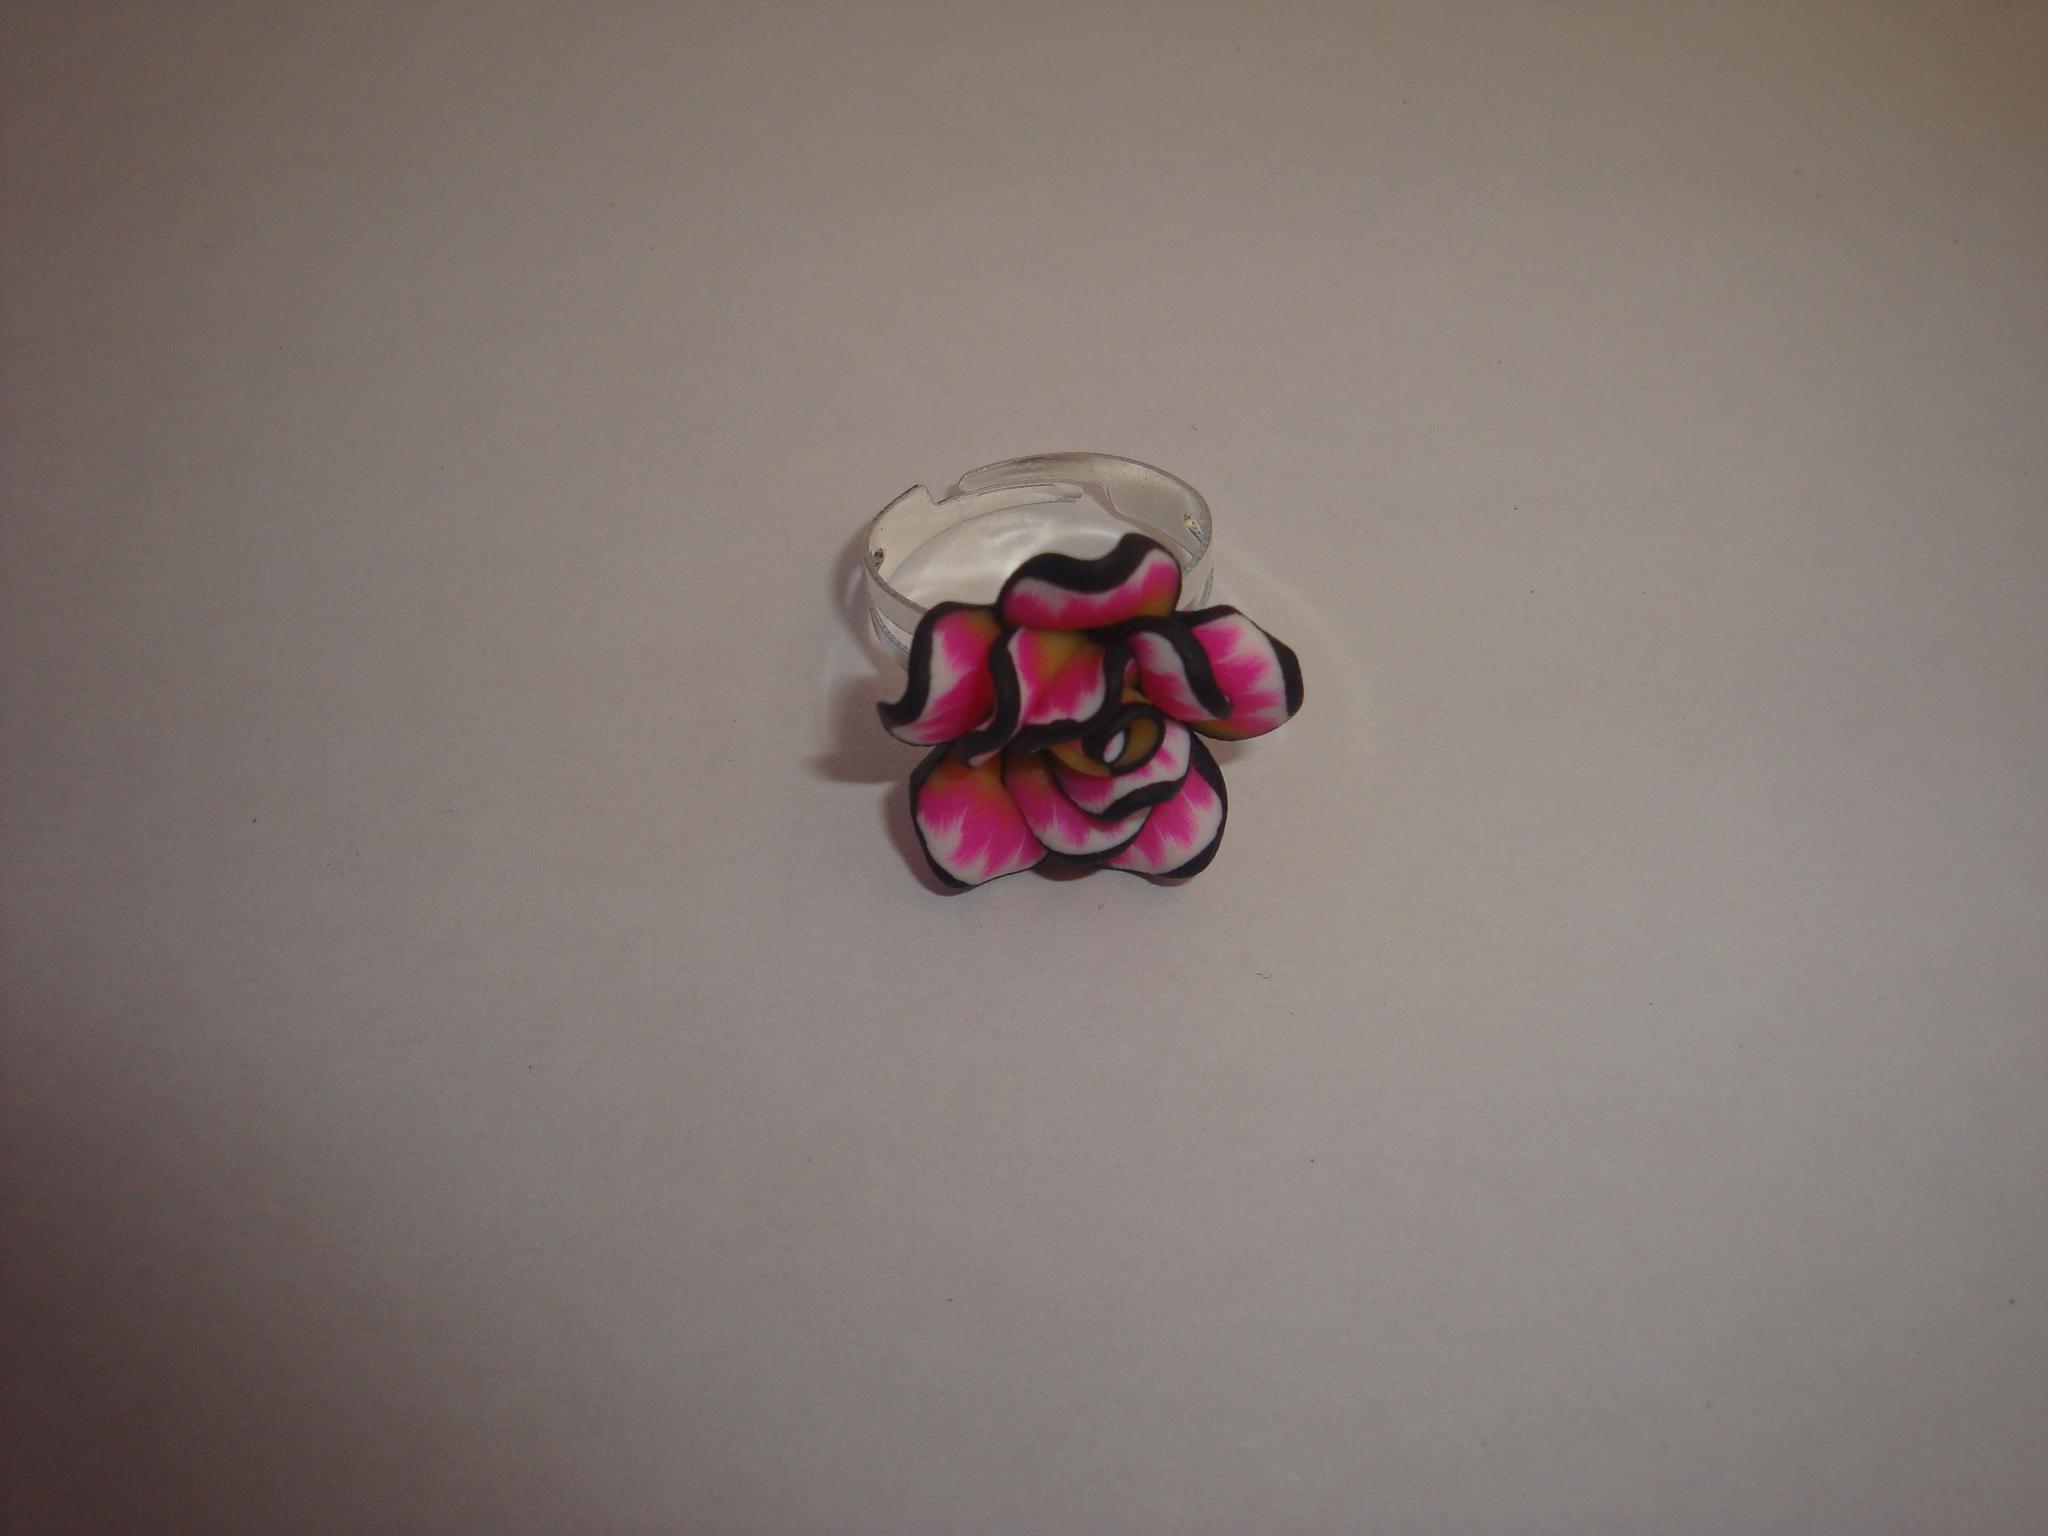 bague fleur en p te fimo rose 424. Black Bedroom Furniture Sets. Home Design Ideas